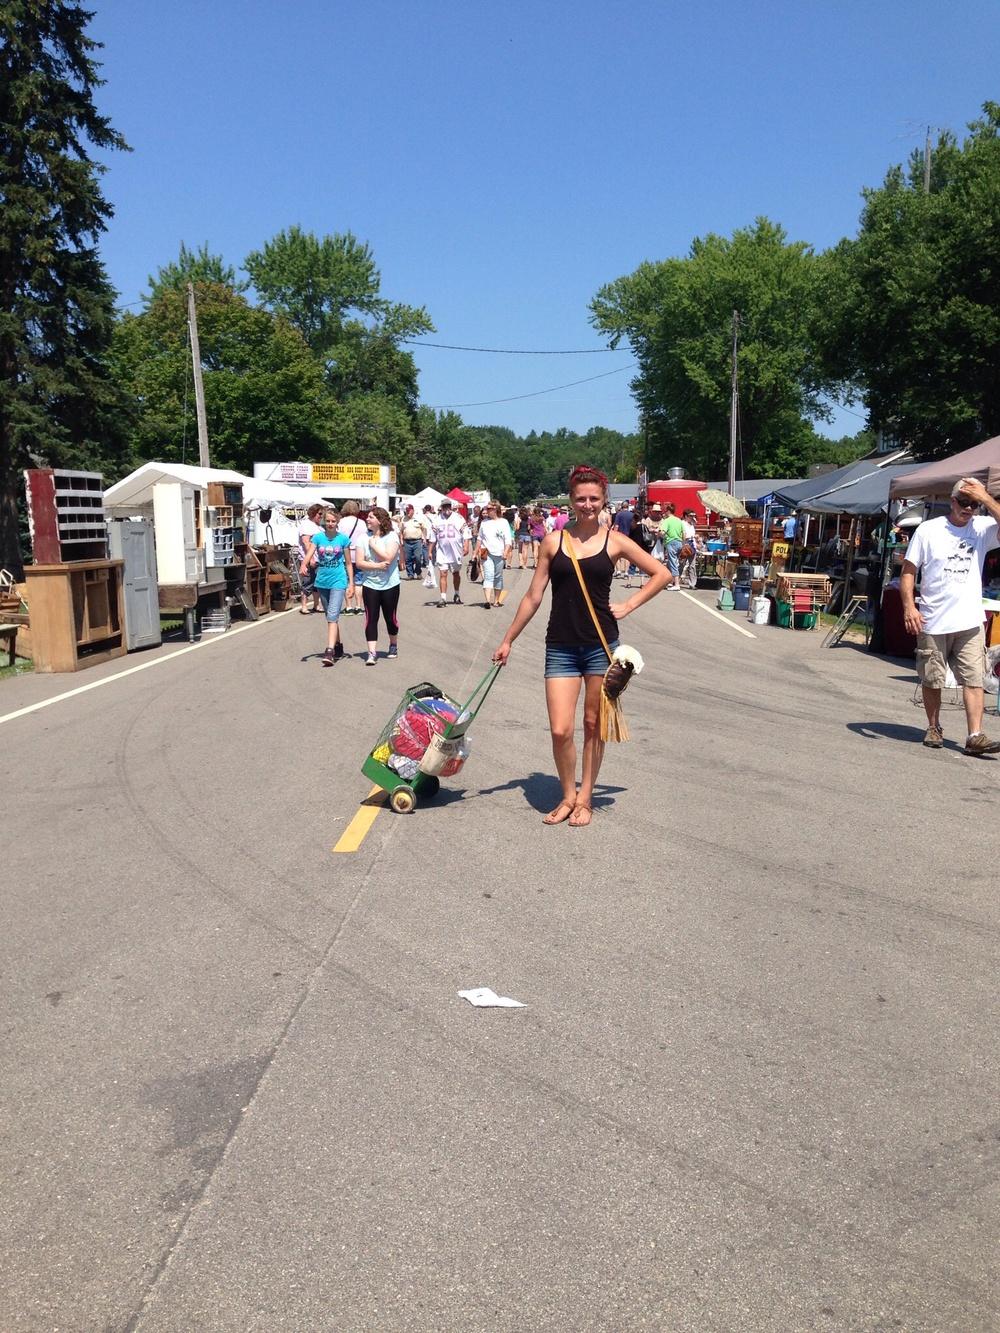 Mia Suntken at Oronoco Gold Rush Days in Minnesota, August 14th, 2015.